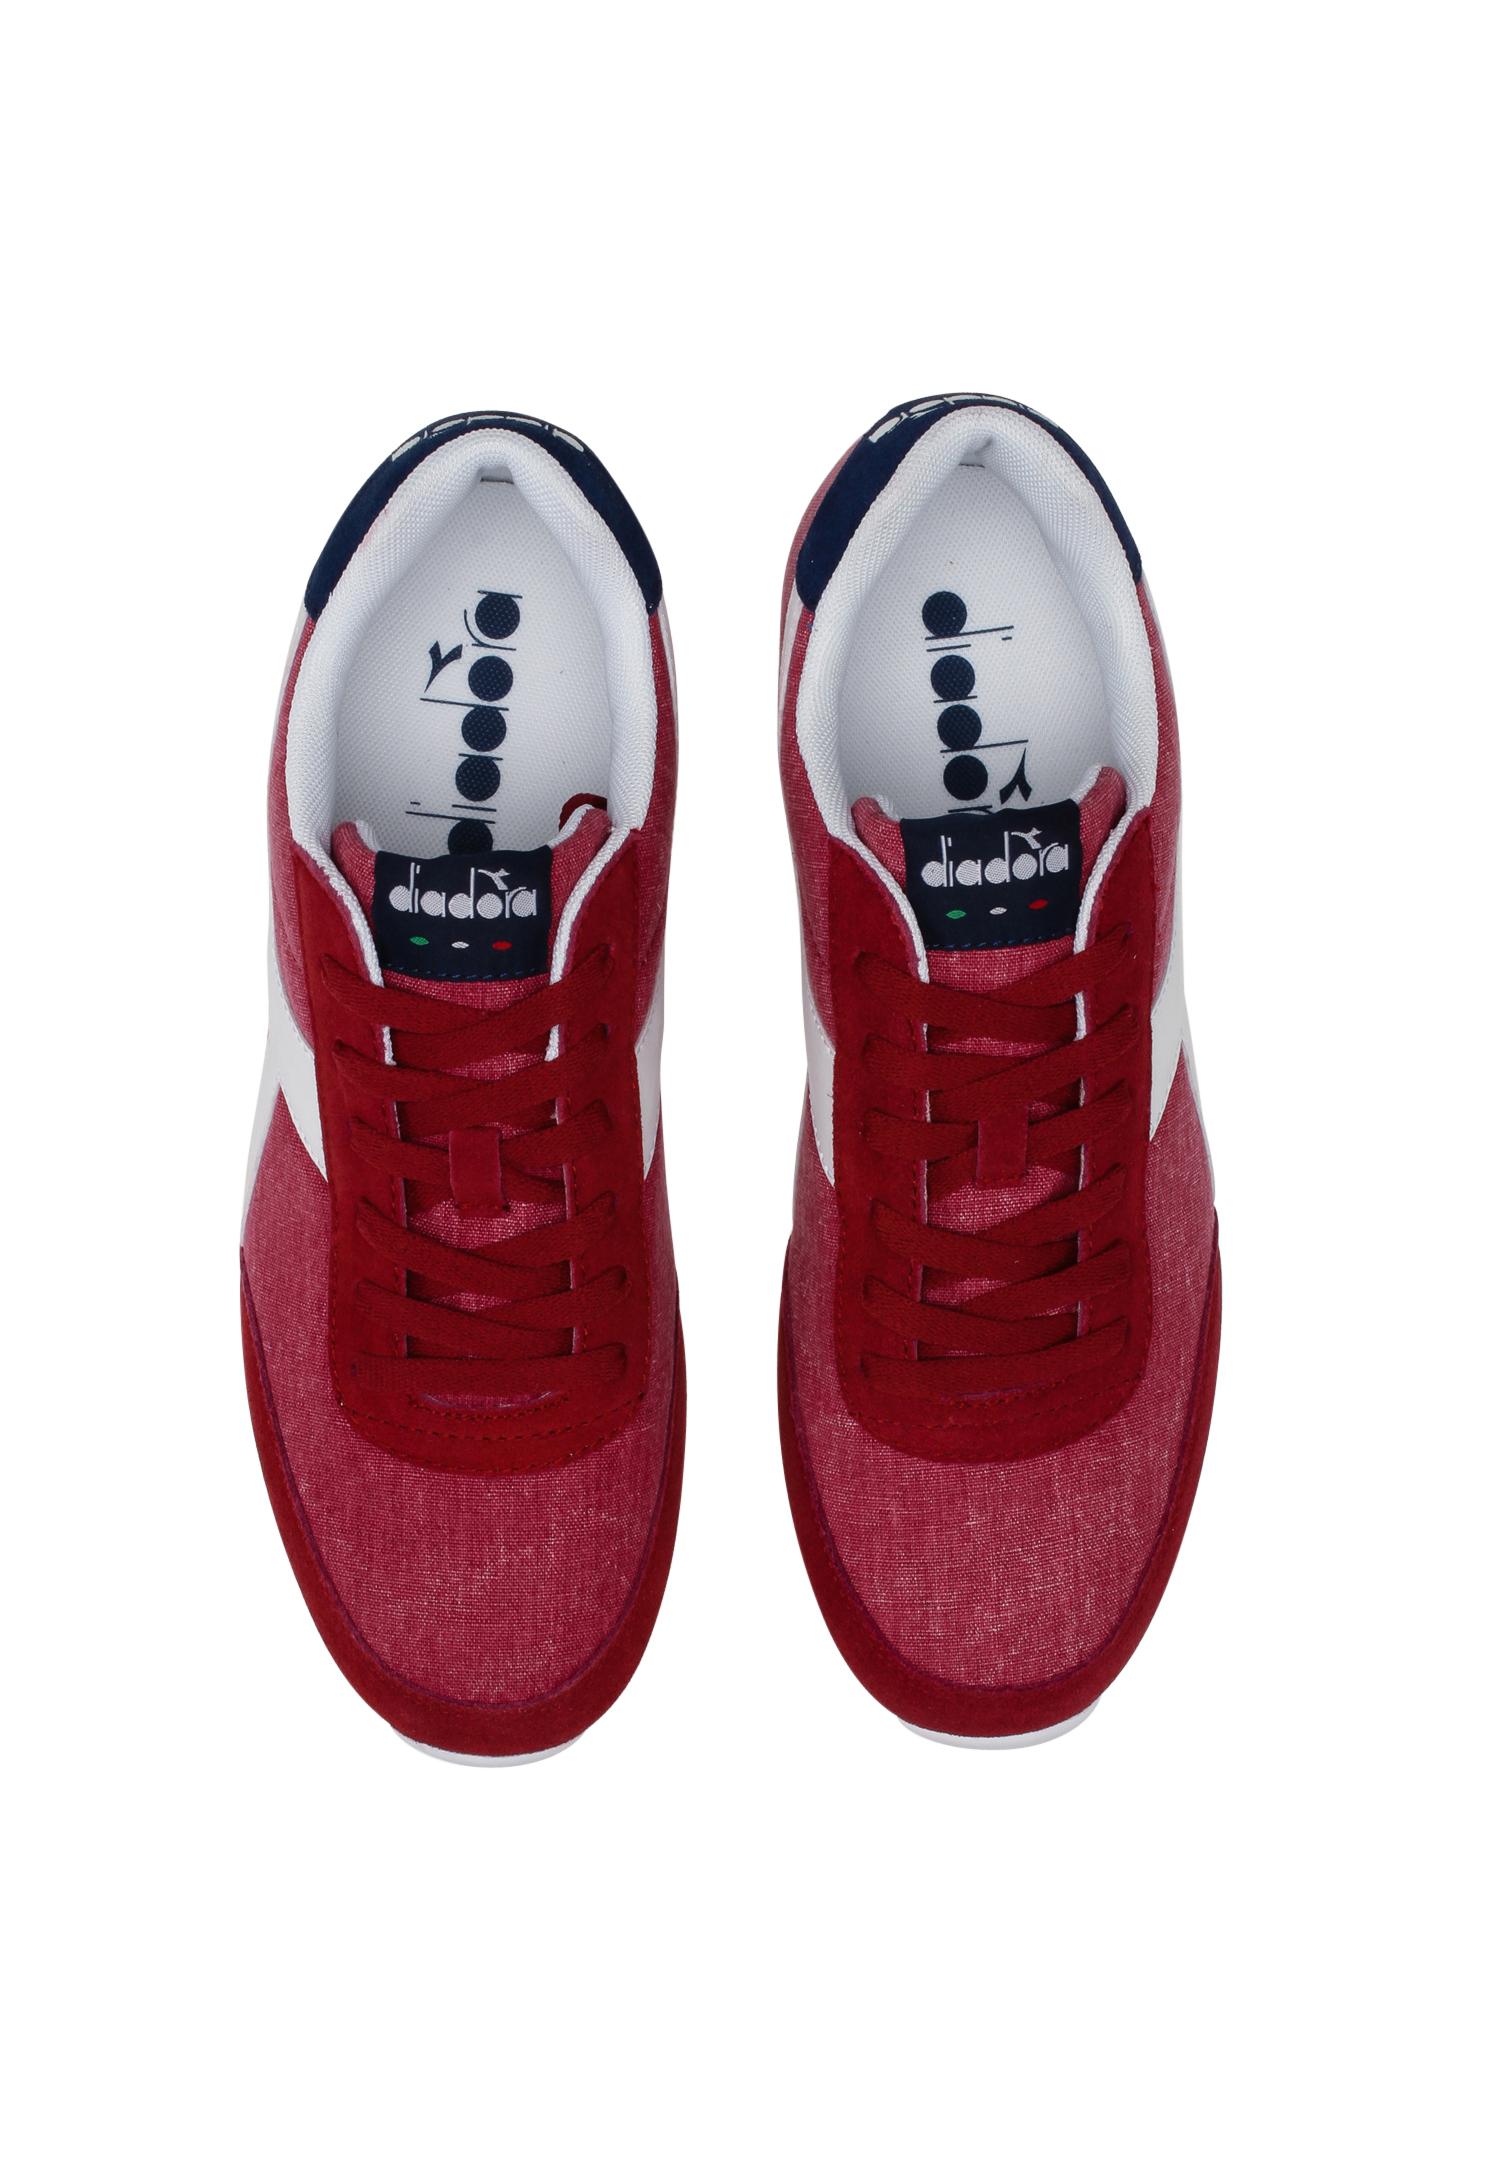 Scarpe-Diadora-Jog-Light-C-Sneakers-sportive-uomo-donna-vari-colori-e-taglie miniatura 11